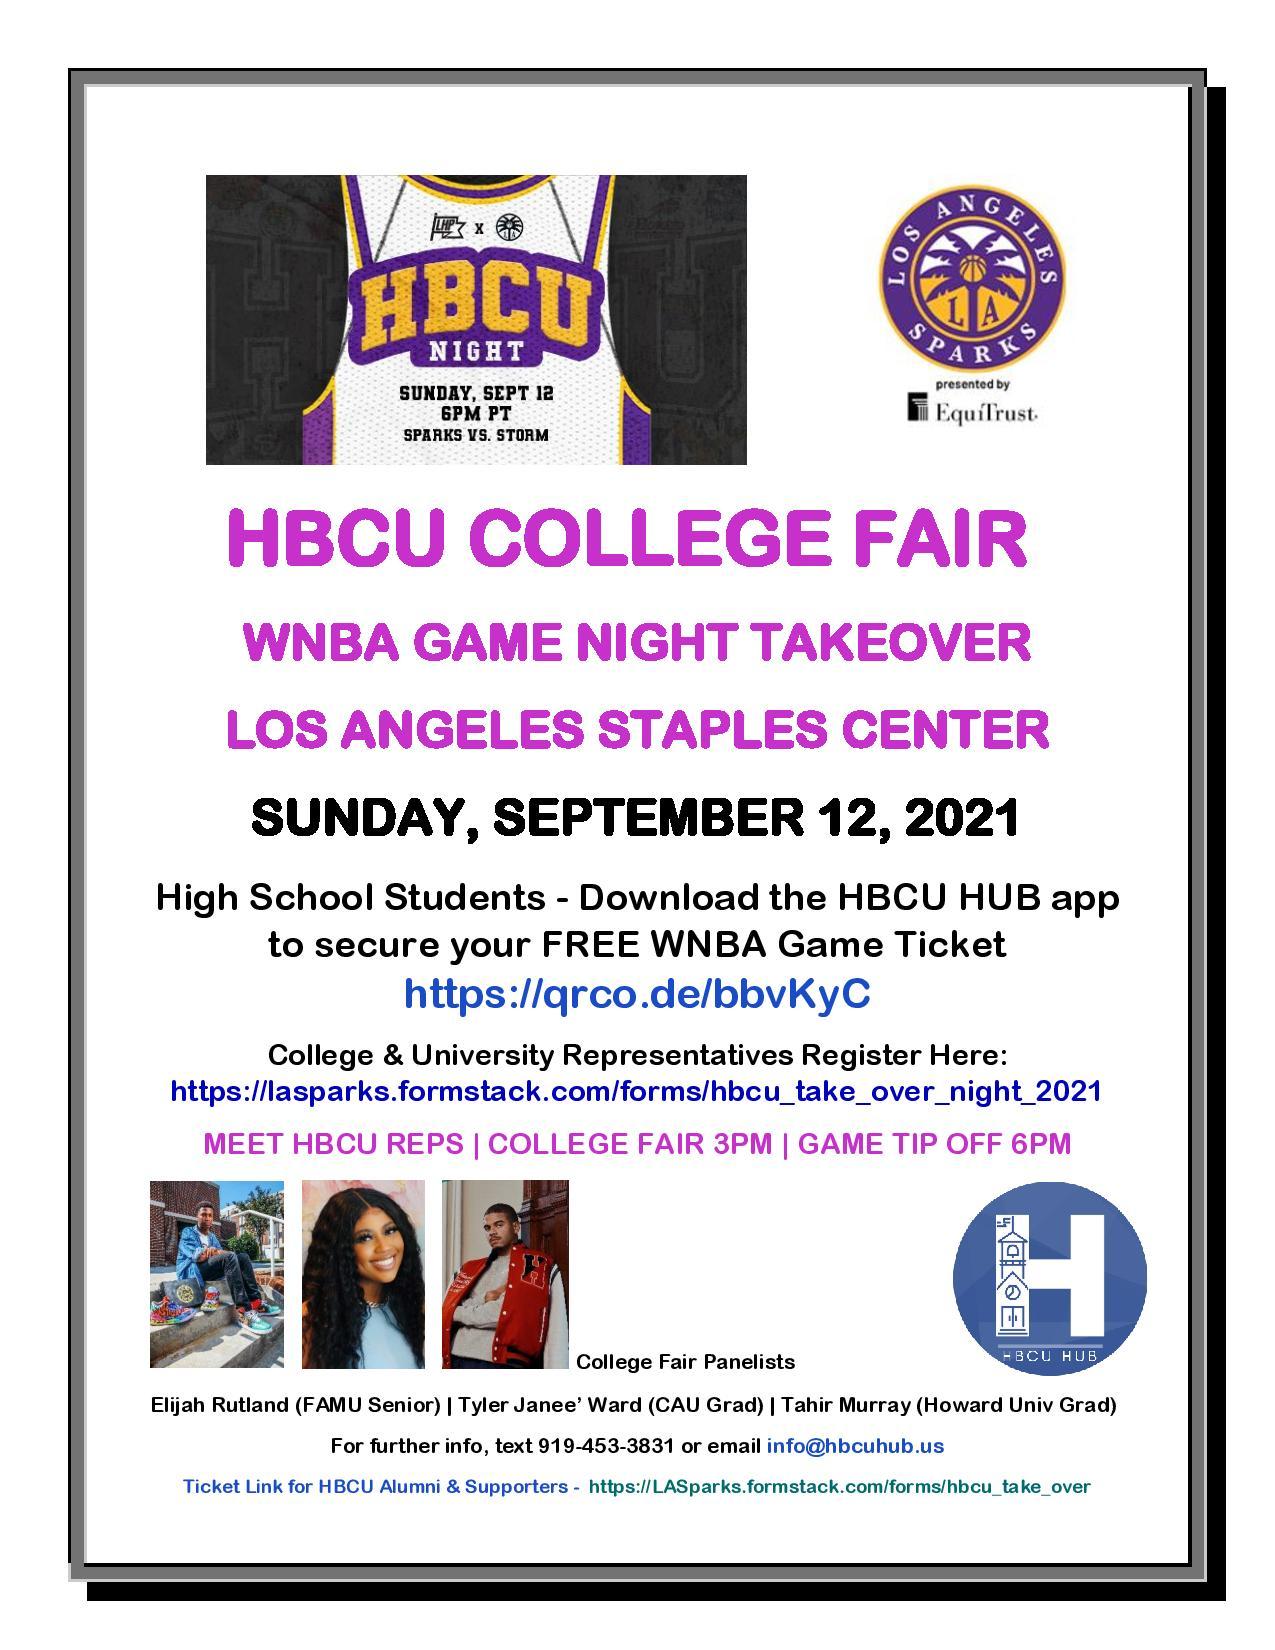 HBCU College Fair 09-12-2021